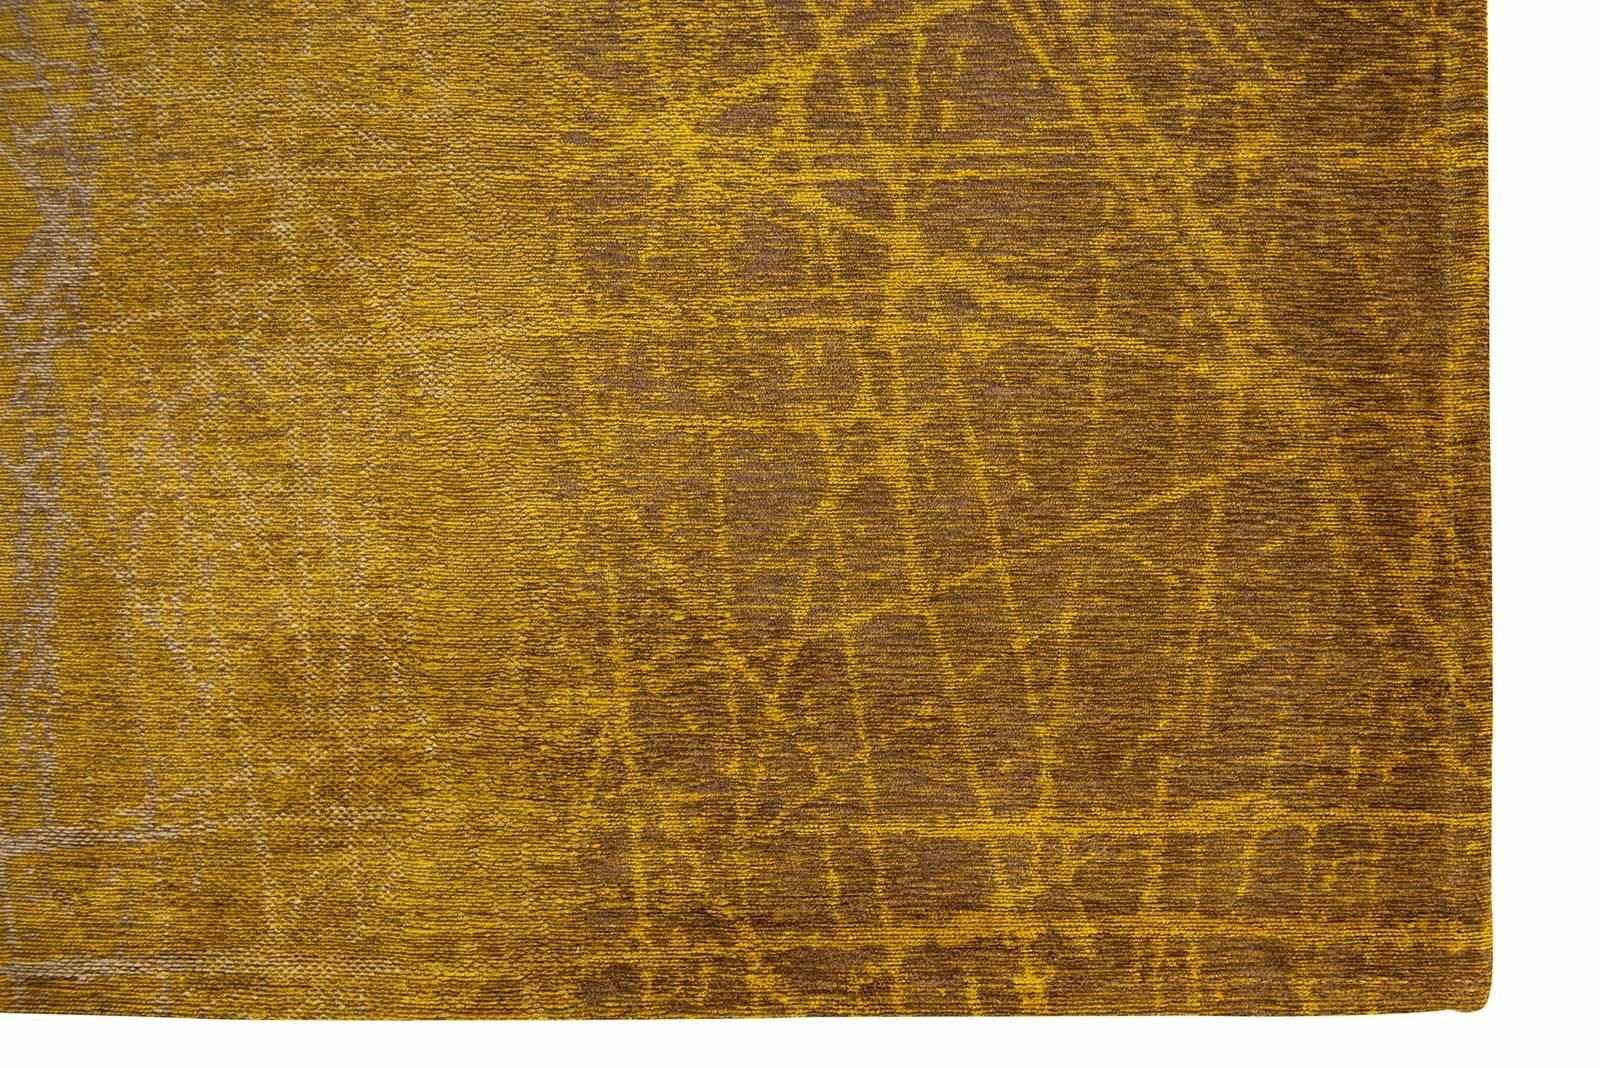 alfombras Louis De Poortere LX 8879 Mad Men Fahrenheit New York Fall corner